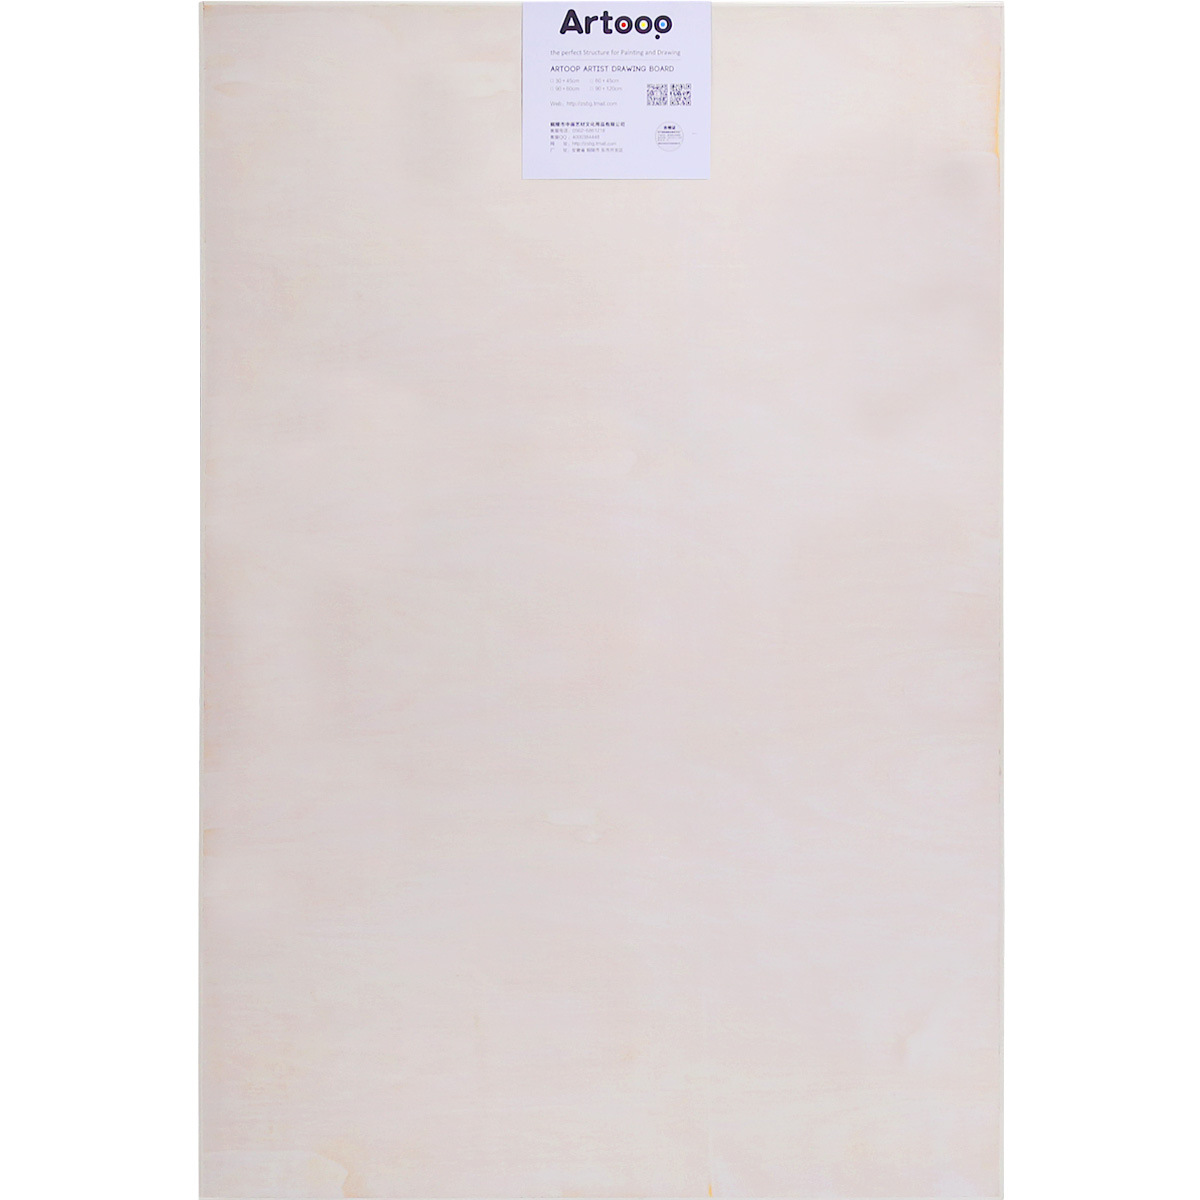 Artoop Sketch Drawing Board 2k Basswood Zhi Hua Frame Plate Half-Open Sketch A1 Design Drawing Board